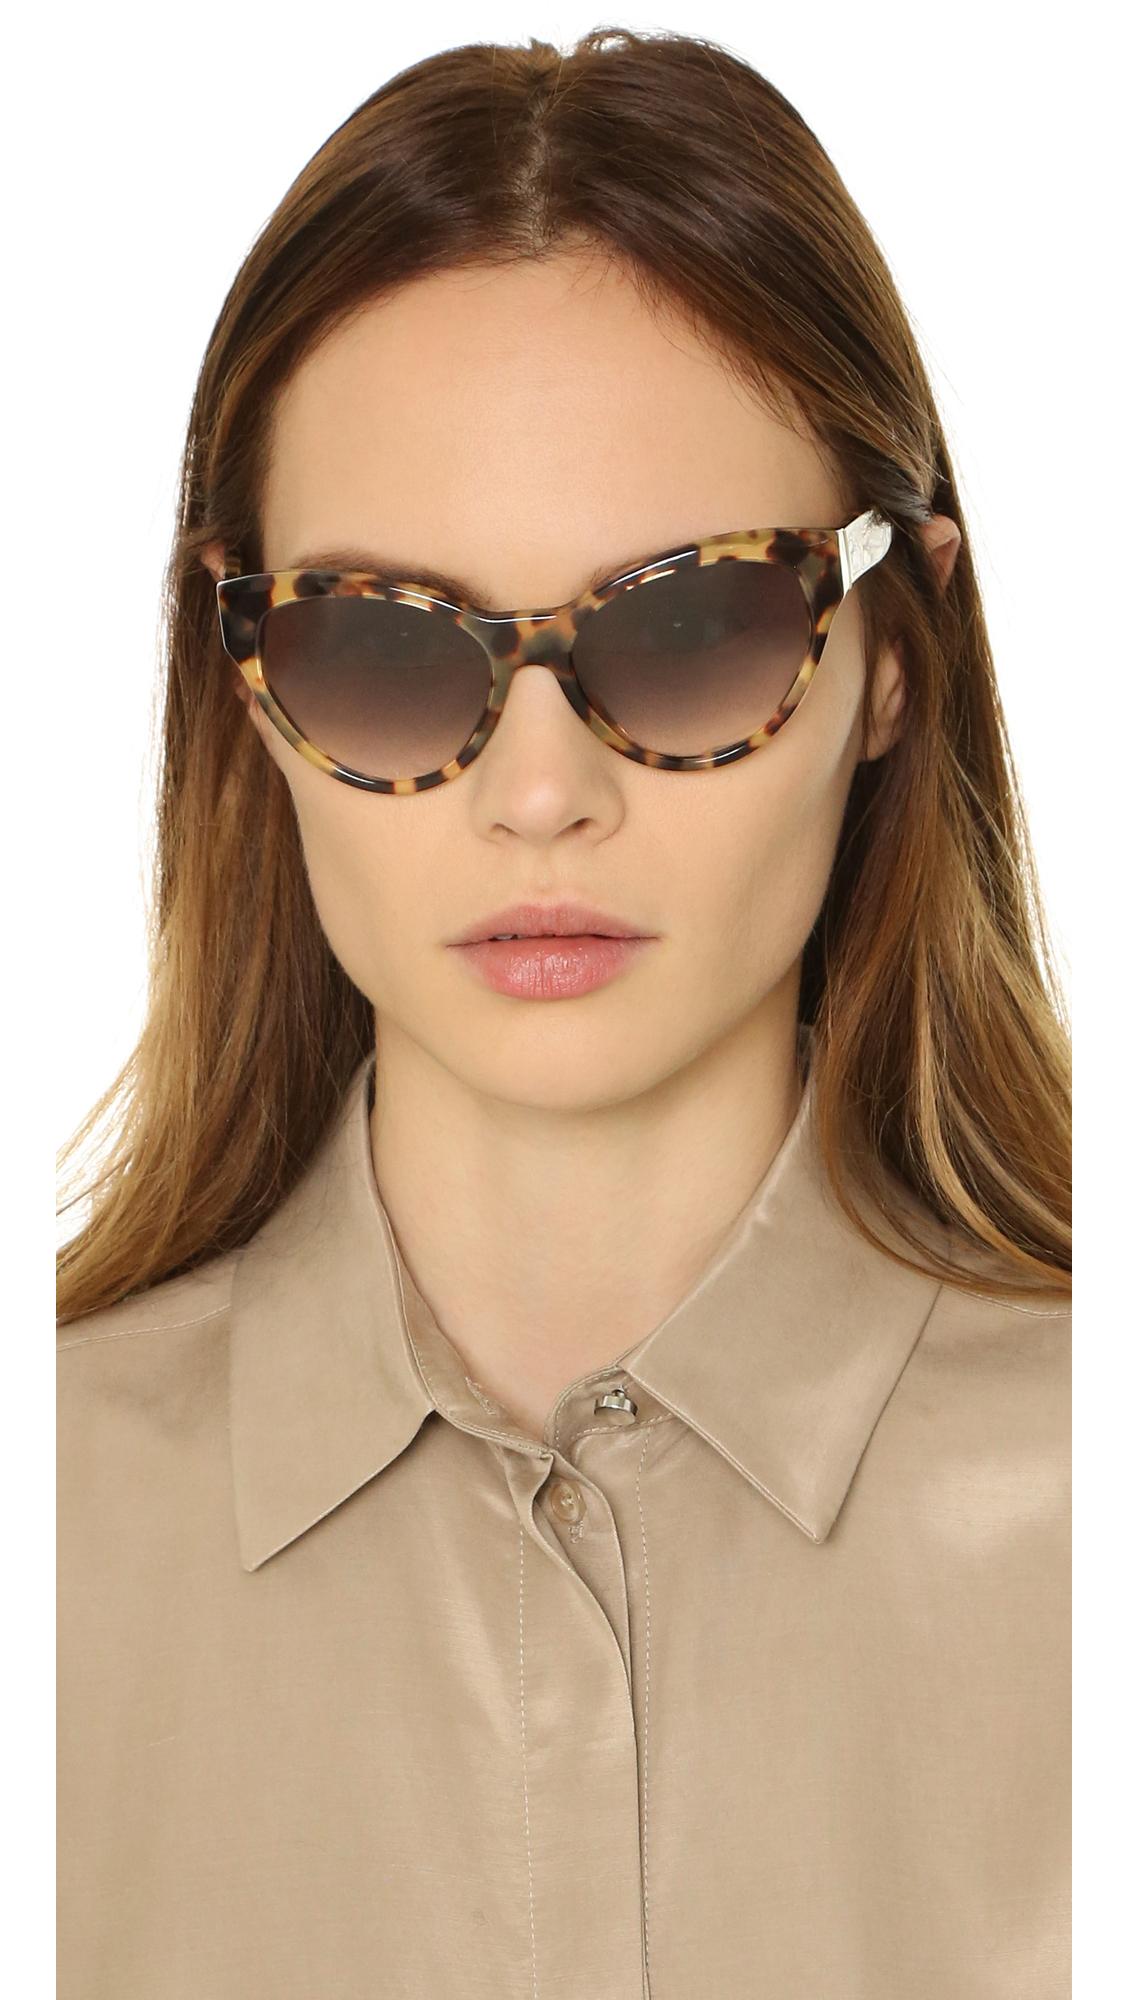 f27b34b14b switzerland prada pr 09qs 2au6s1 havana cat eye plastic sunglasses 80525  55885  switzerland lyst prada cat eye sunglasses 34318 c9cda